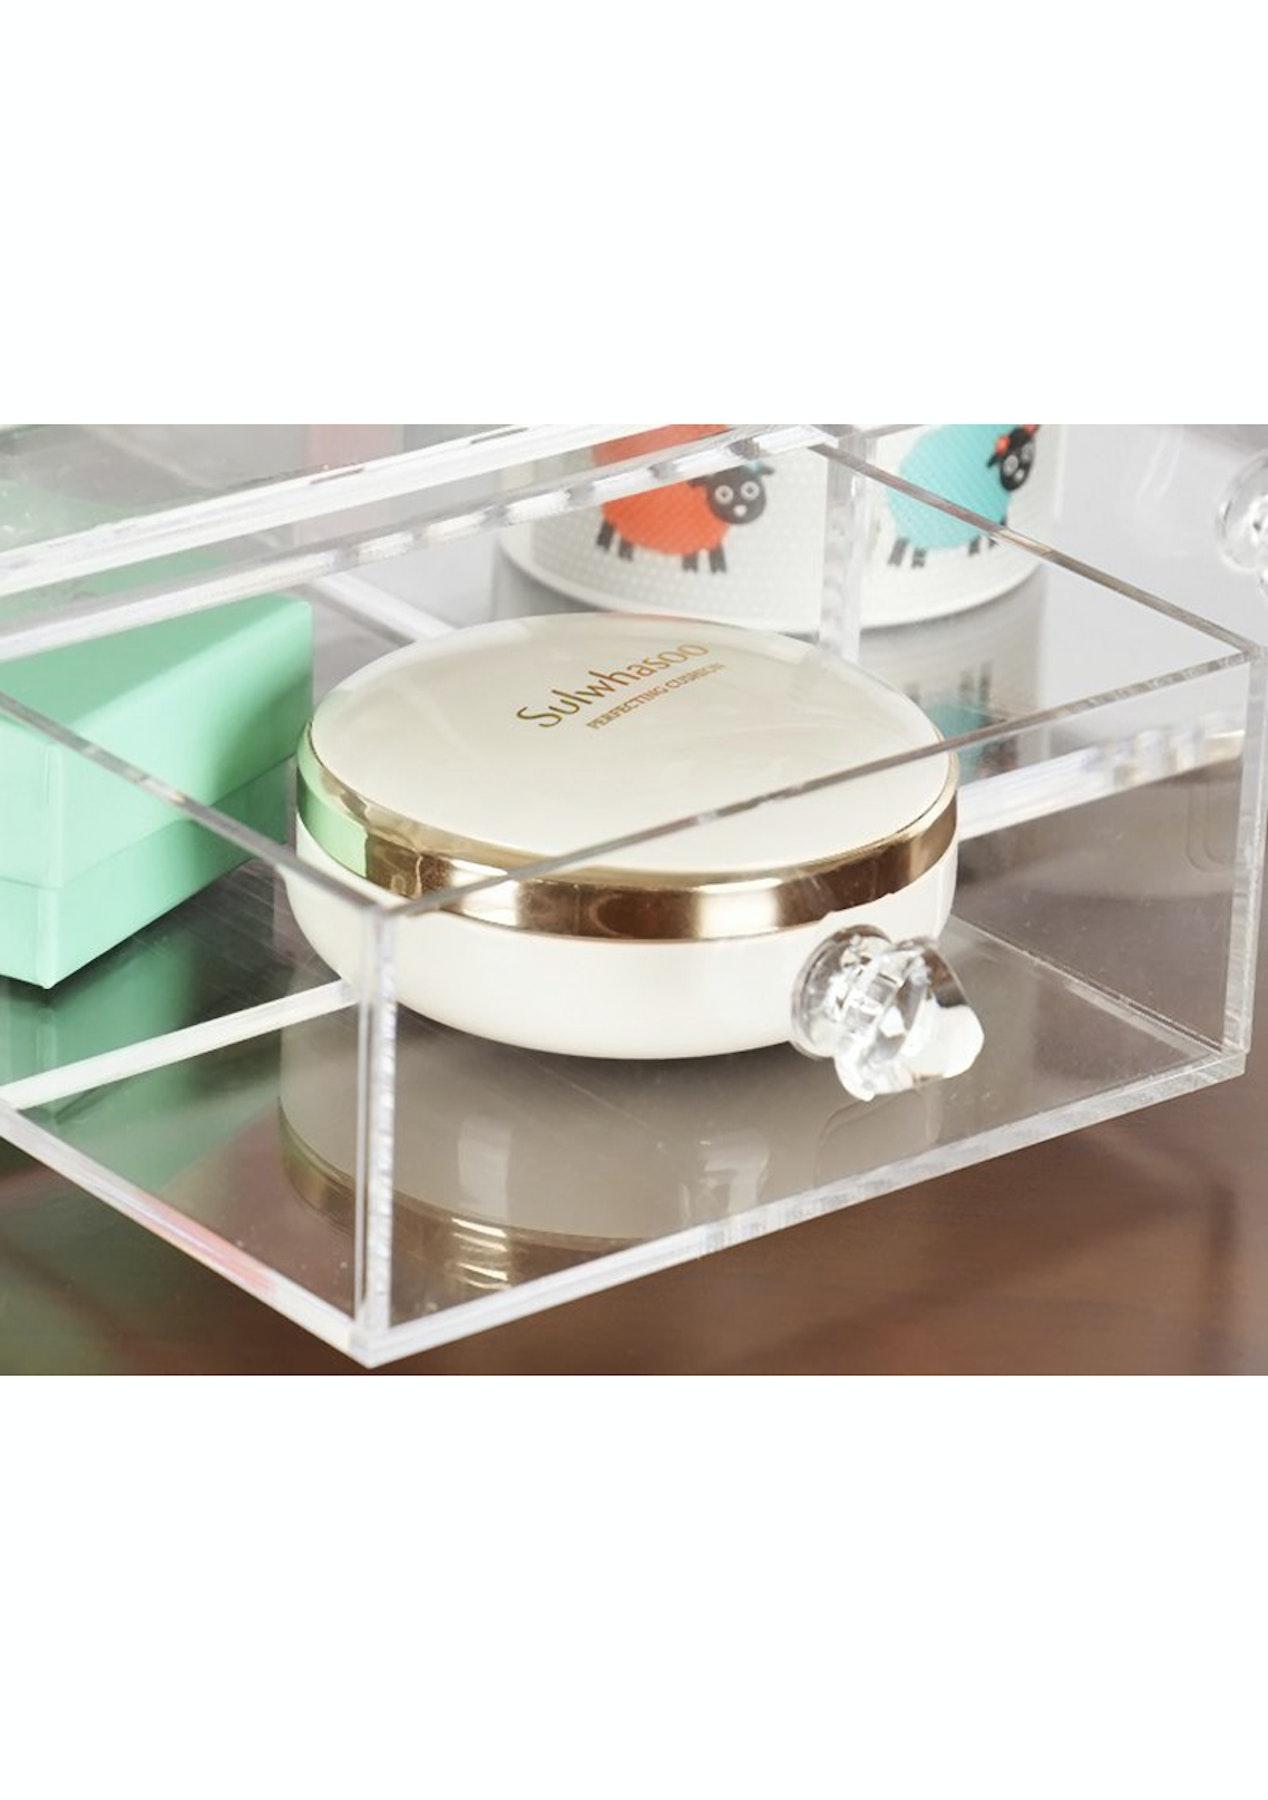 Clamshell Make Up Organiser Cosmetics Storage Box